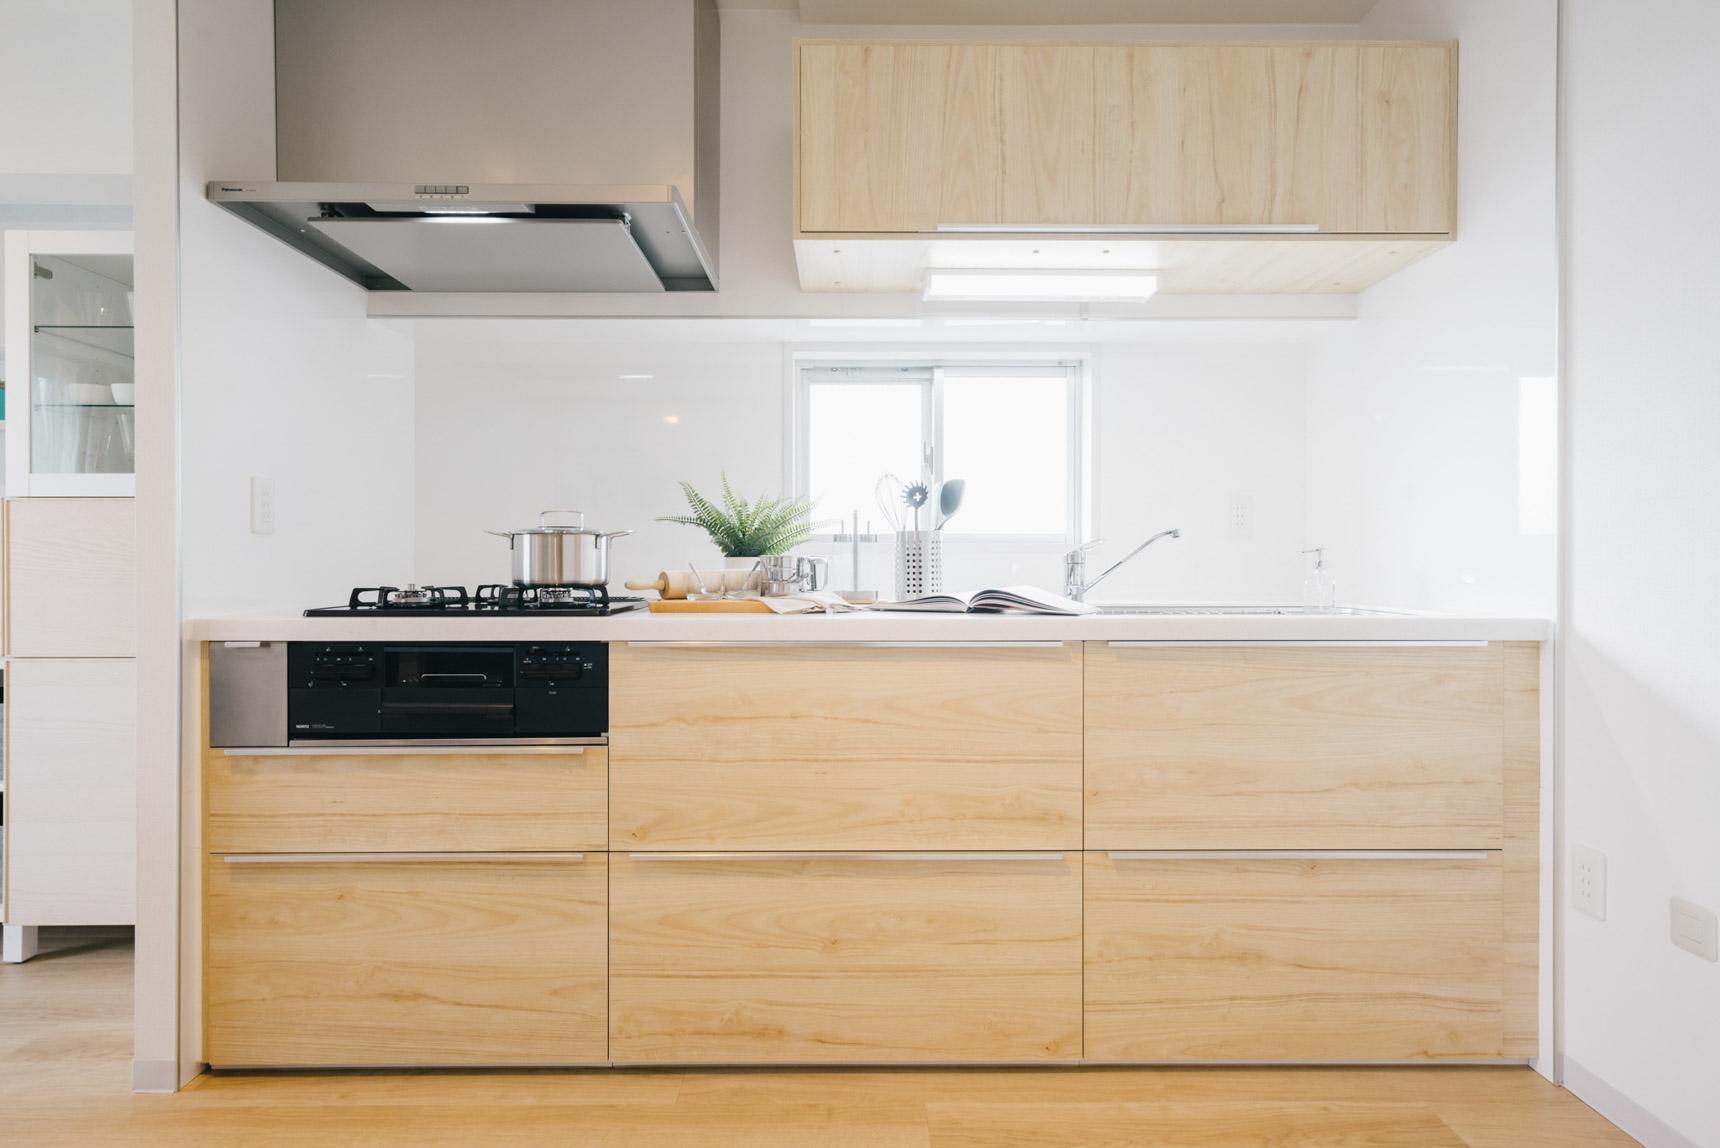 2DKのお部屋に付いているのは、木目調の明るい色合いのキッチン。